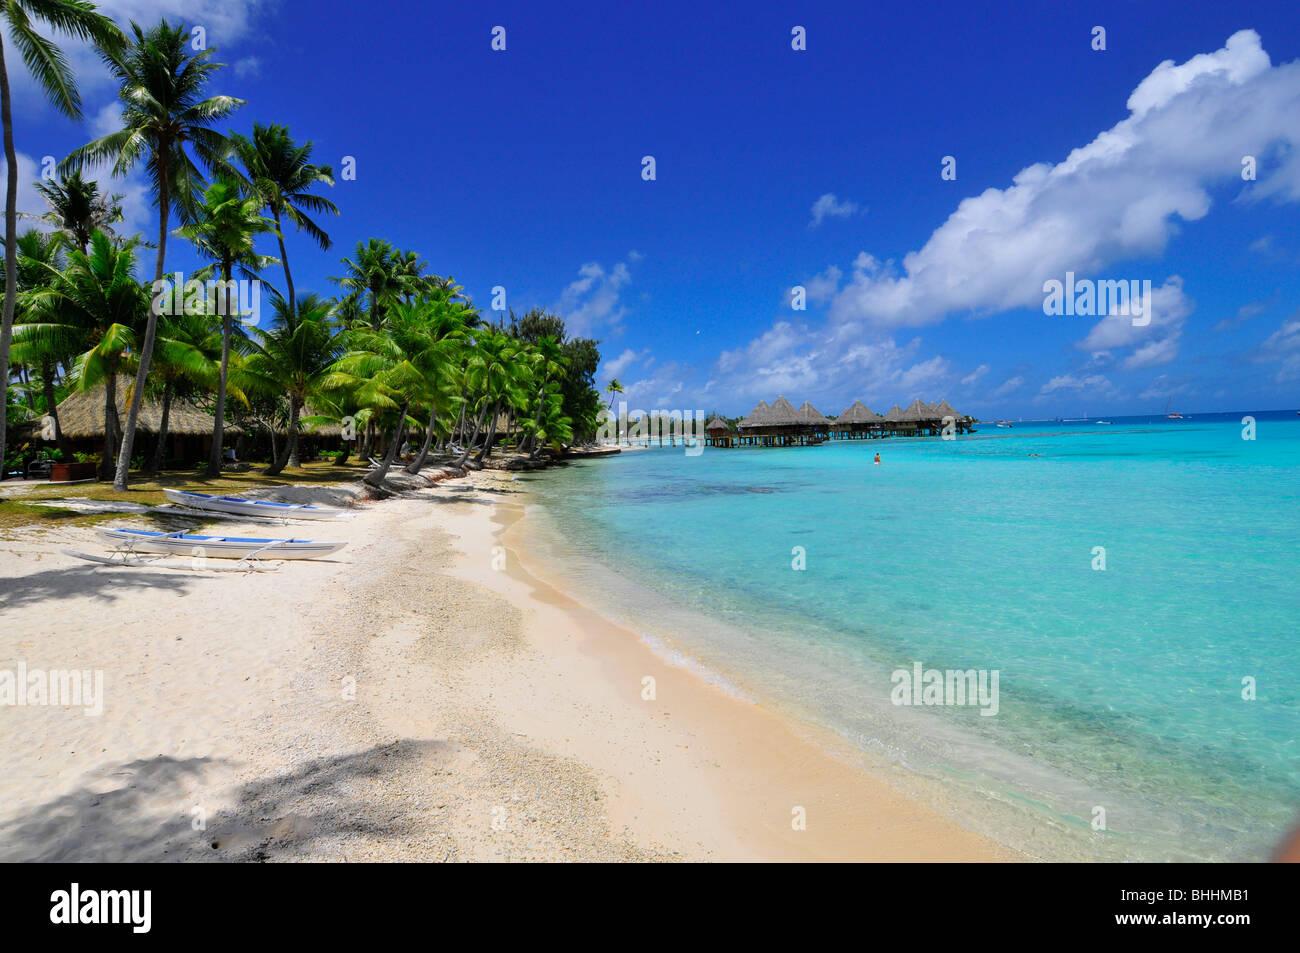 Overwater bungalows in Rangiroa, French Polynesia - Stock Image